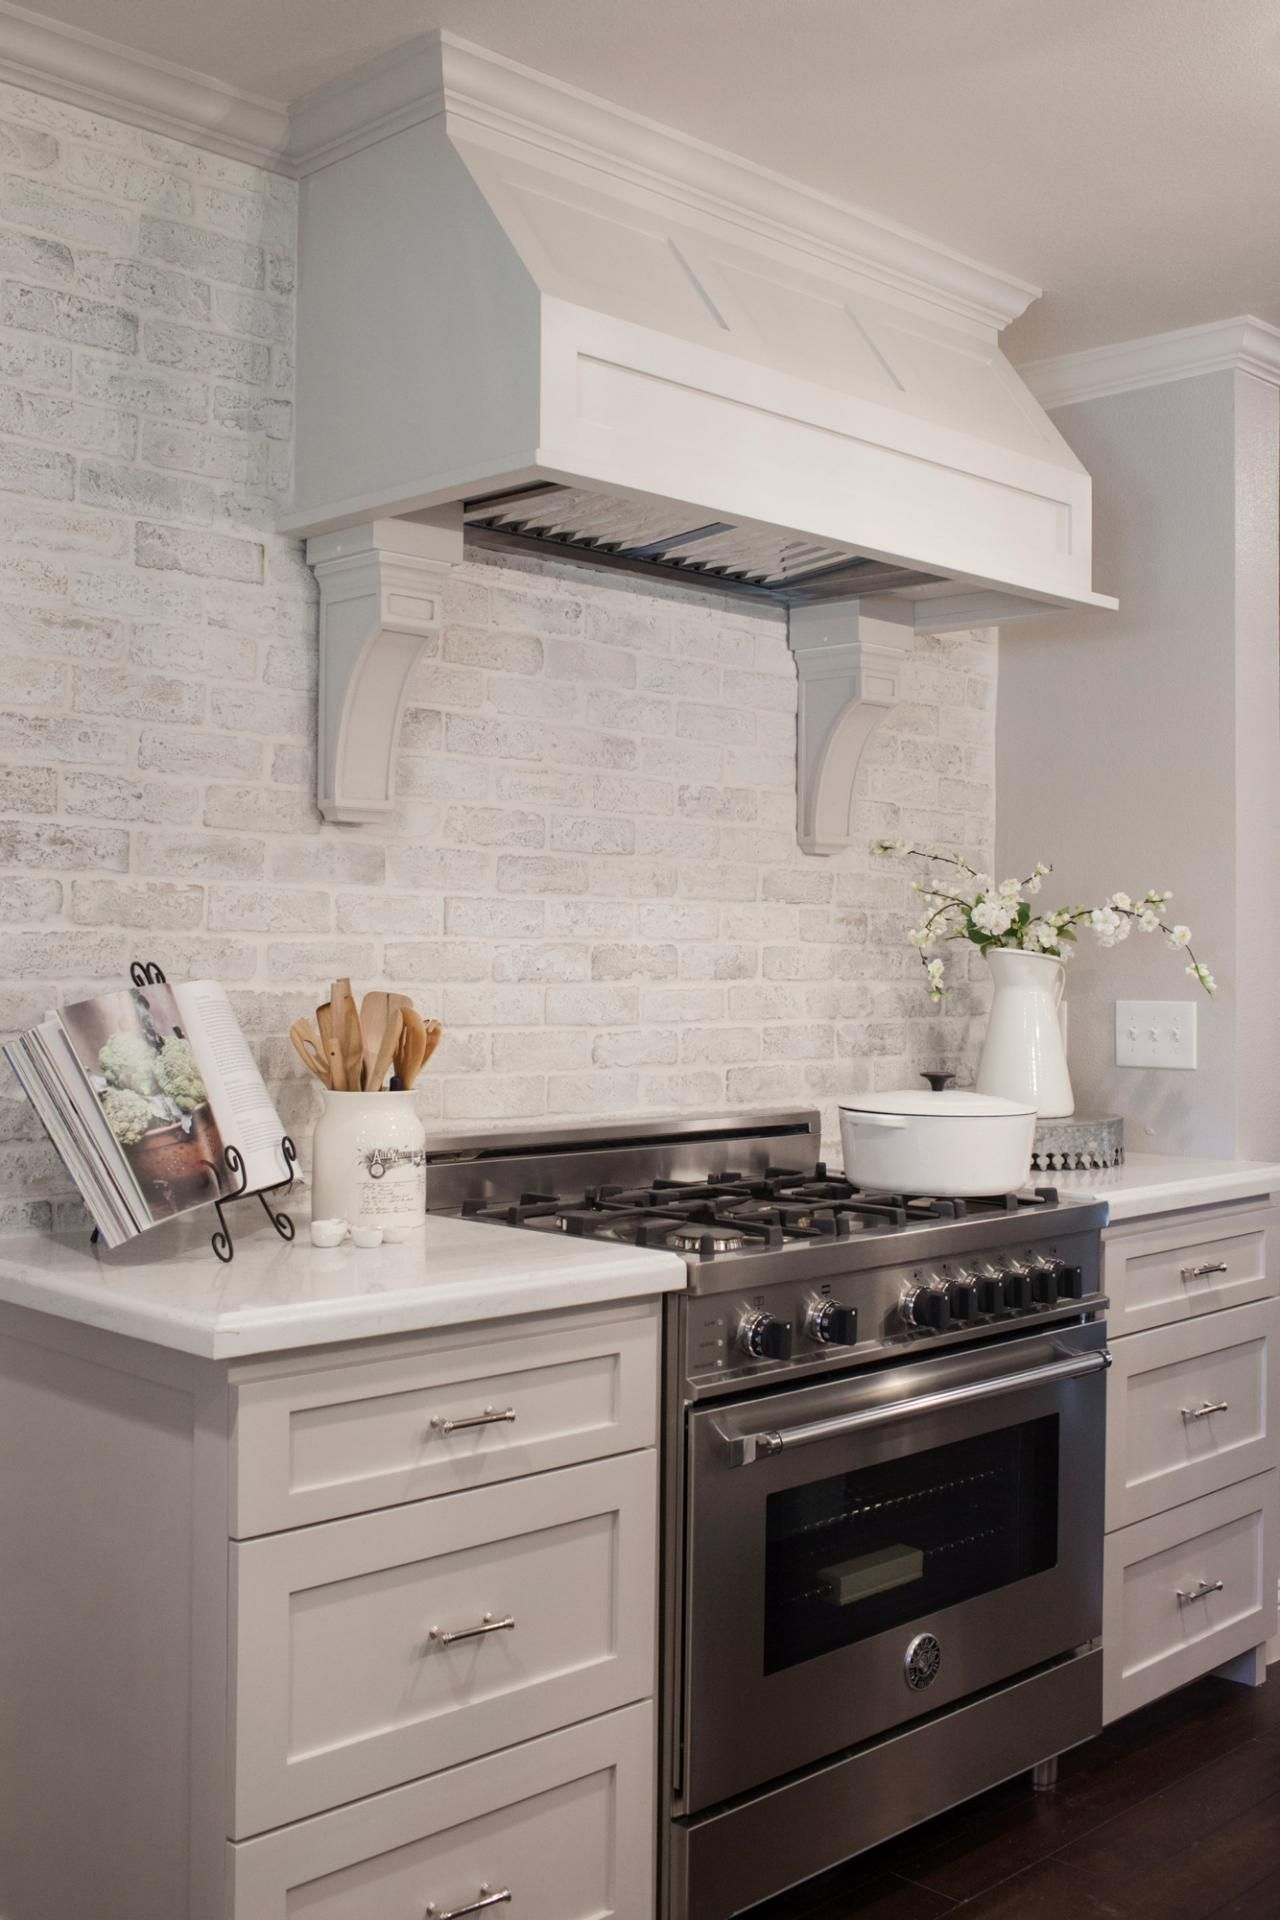 Fixer Upper with Brick Backsplash Kitchen